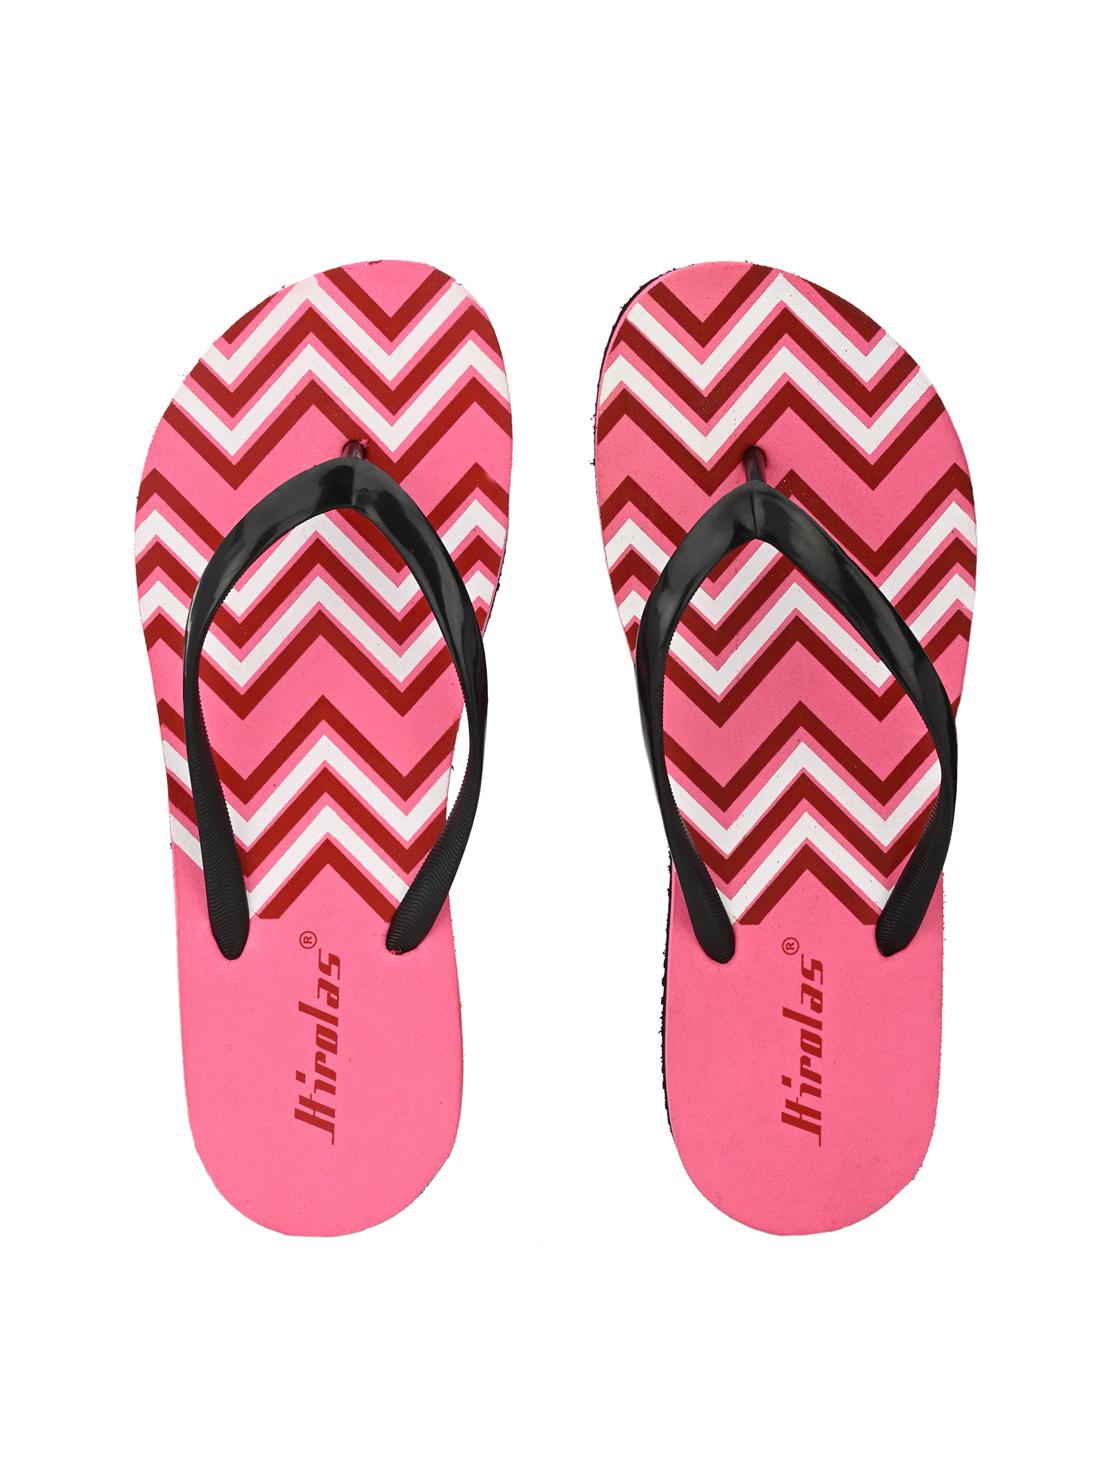 Hirolas | Hirolas® printed Flip Flop  Slippers for Women - Pink/Red